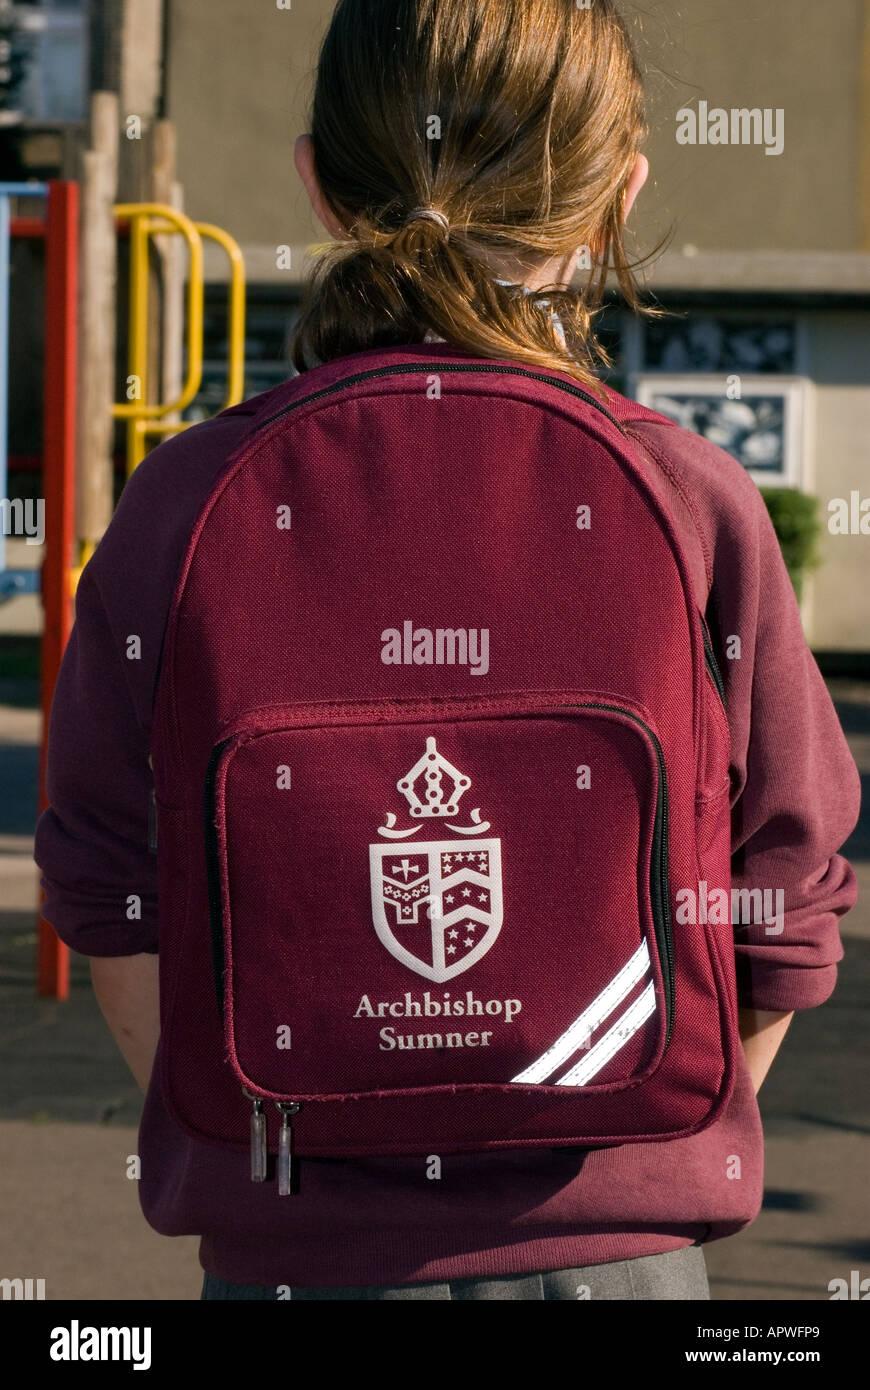 Primary schoolgirl wearing school logo backpack - Stock Image